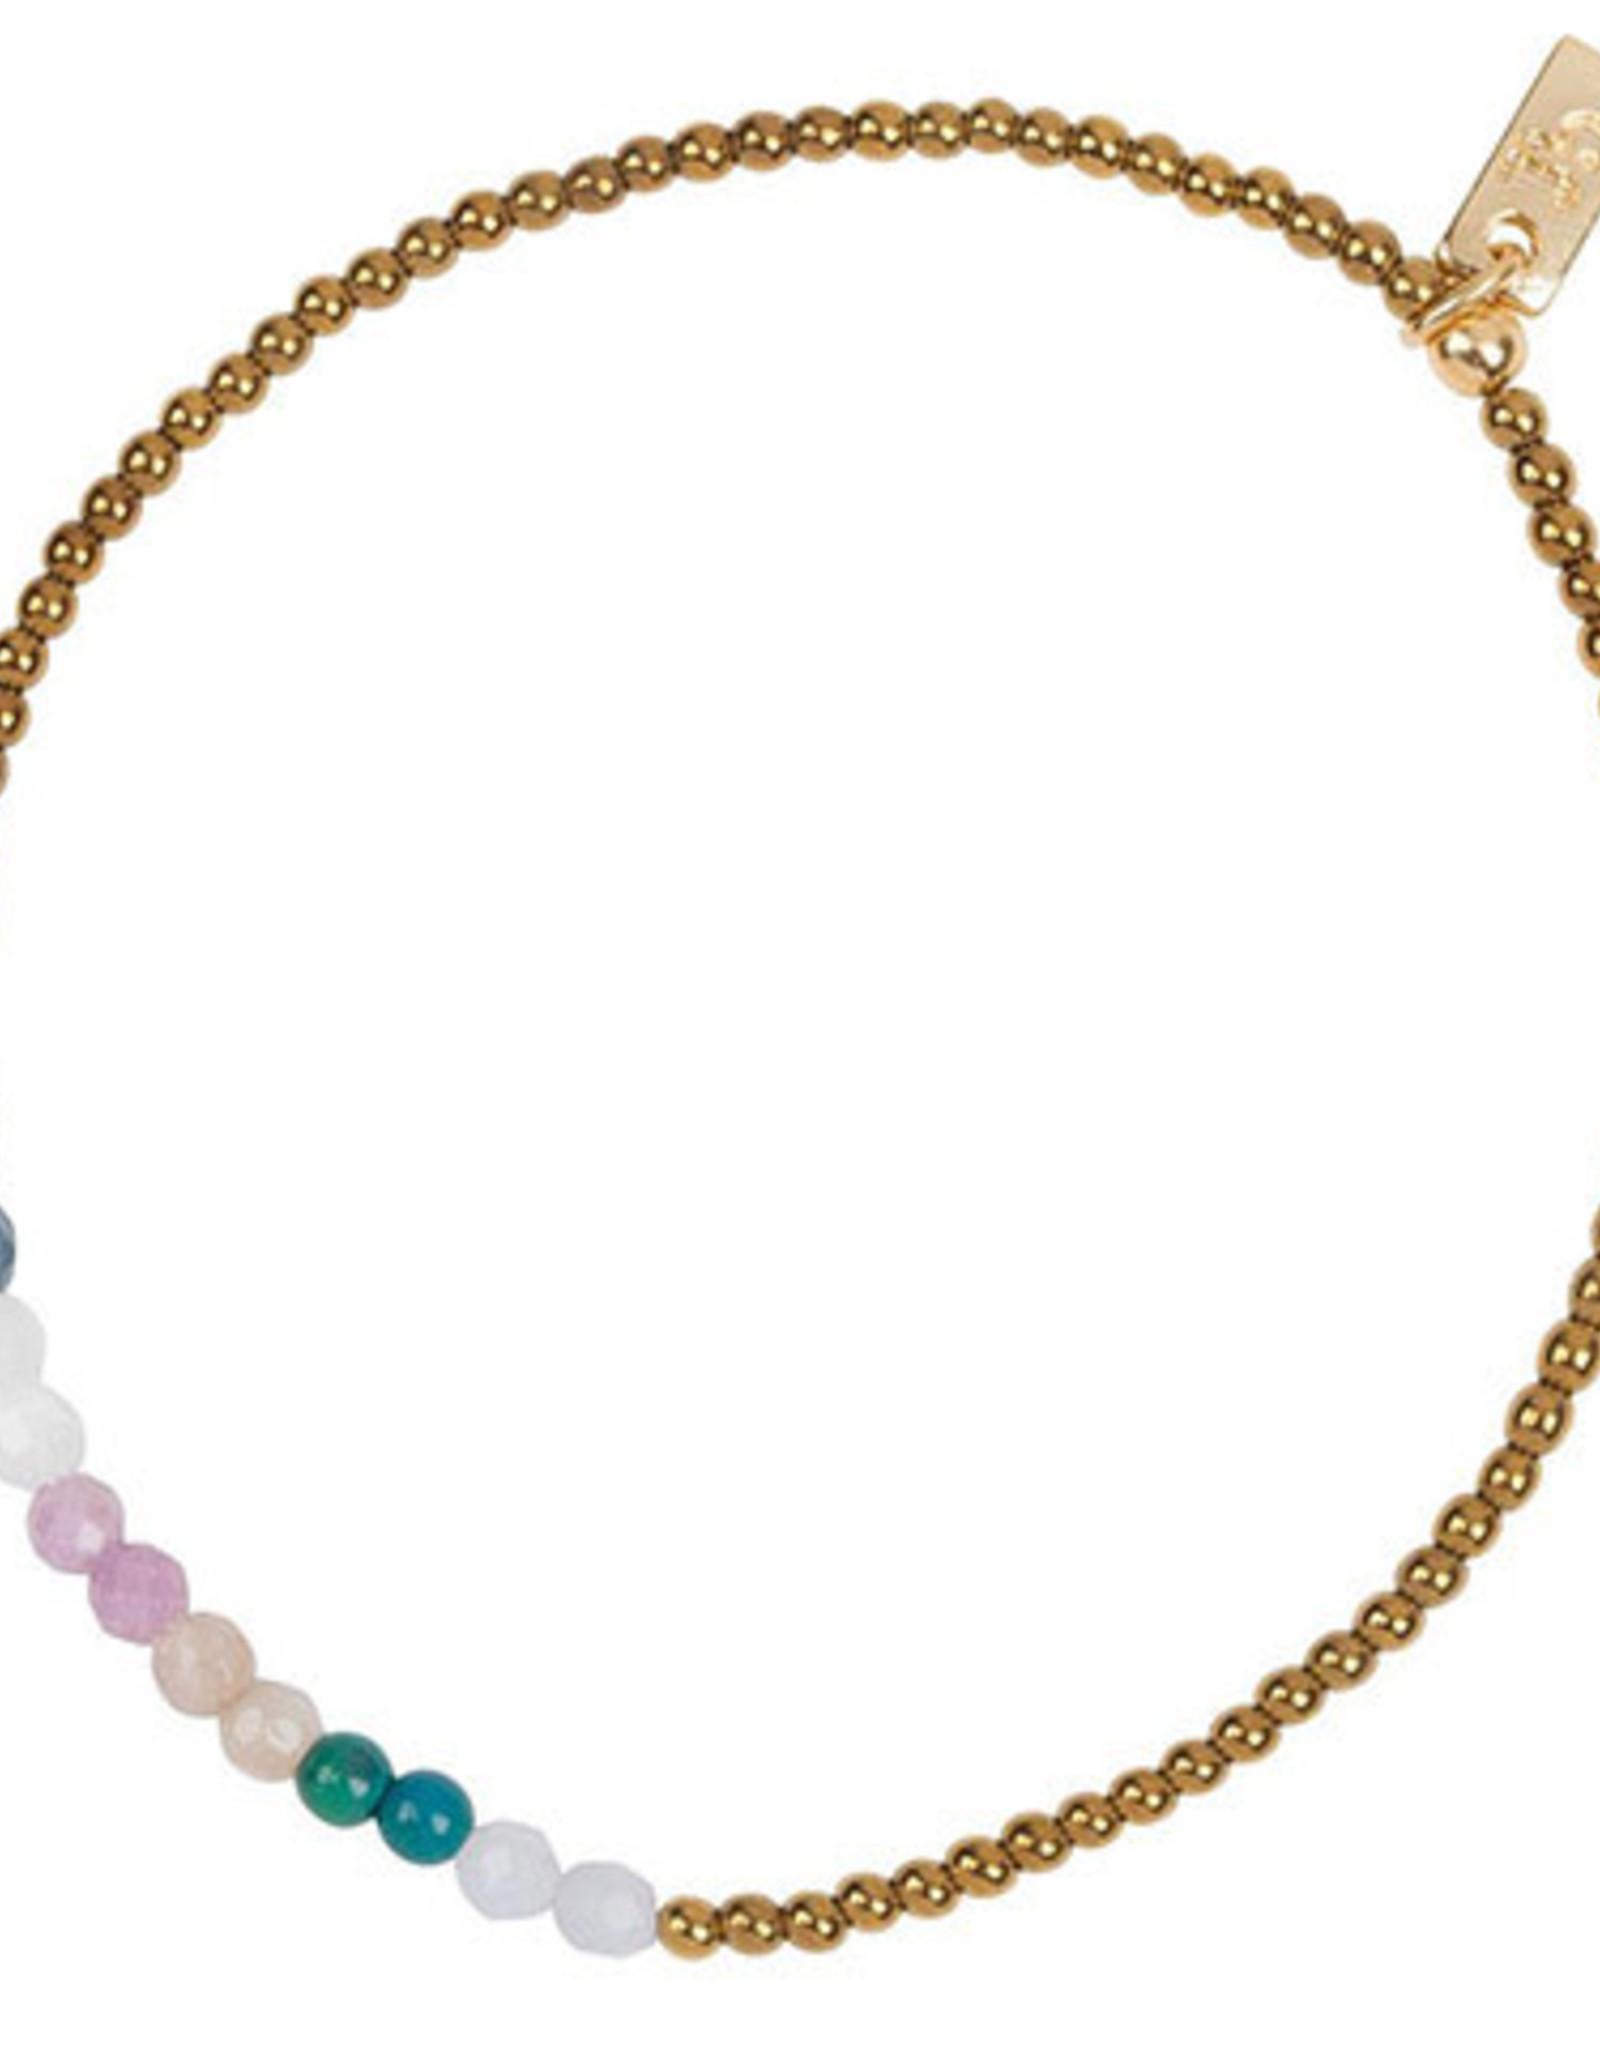 Jules Bean Armband Collectabean Doux-hematite/chrysocolla/chalcedon/pearl/sunstone/phosphosiderite